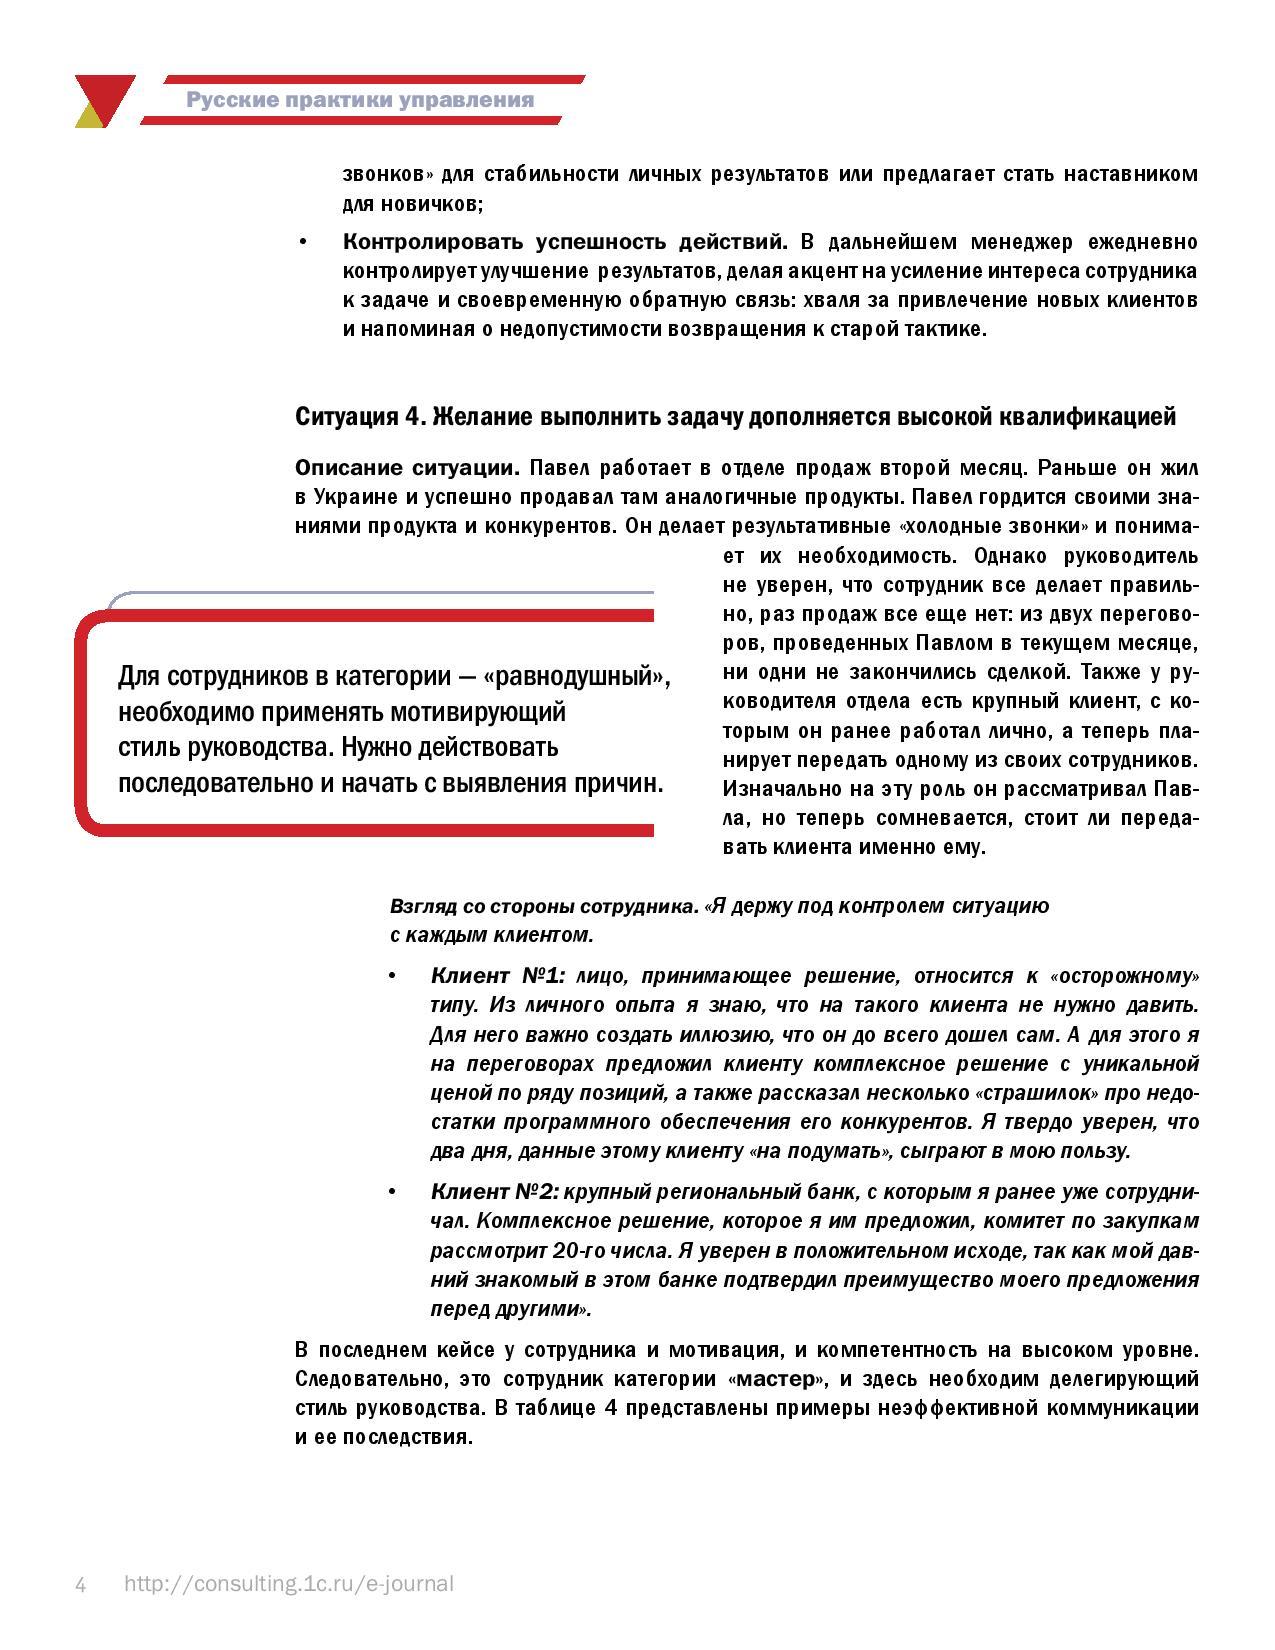 Situacionnyy_podhod_Cast__2._Upravlaem_predpriatiem__04_2015-page-004